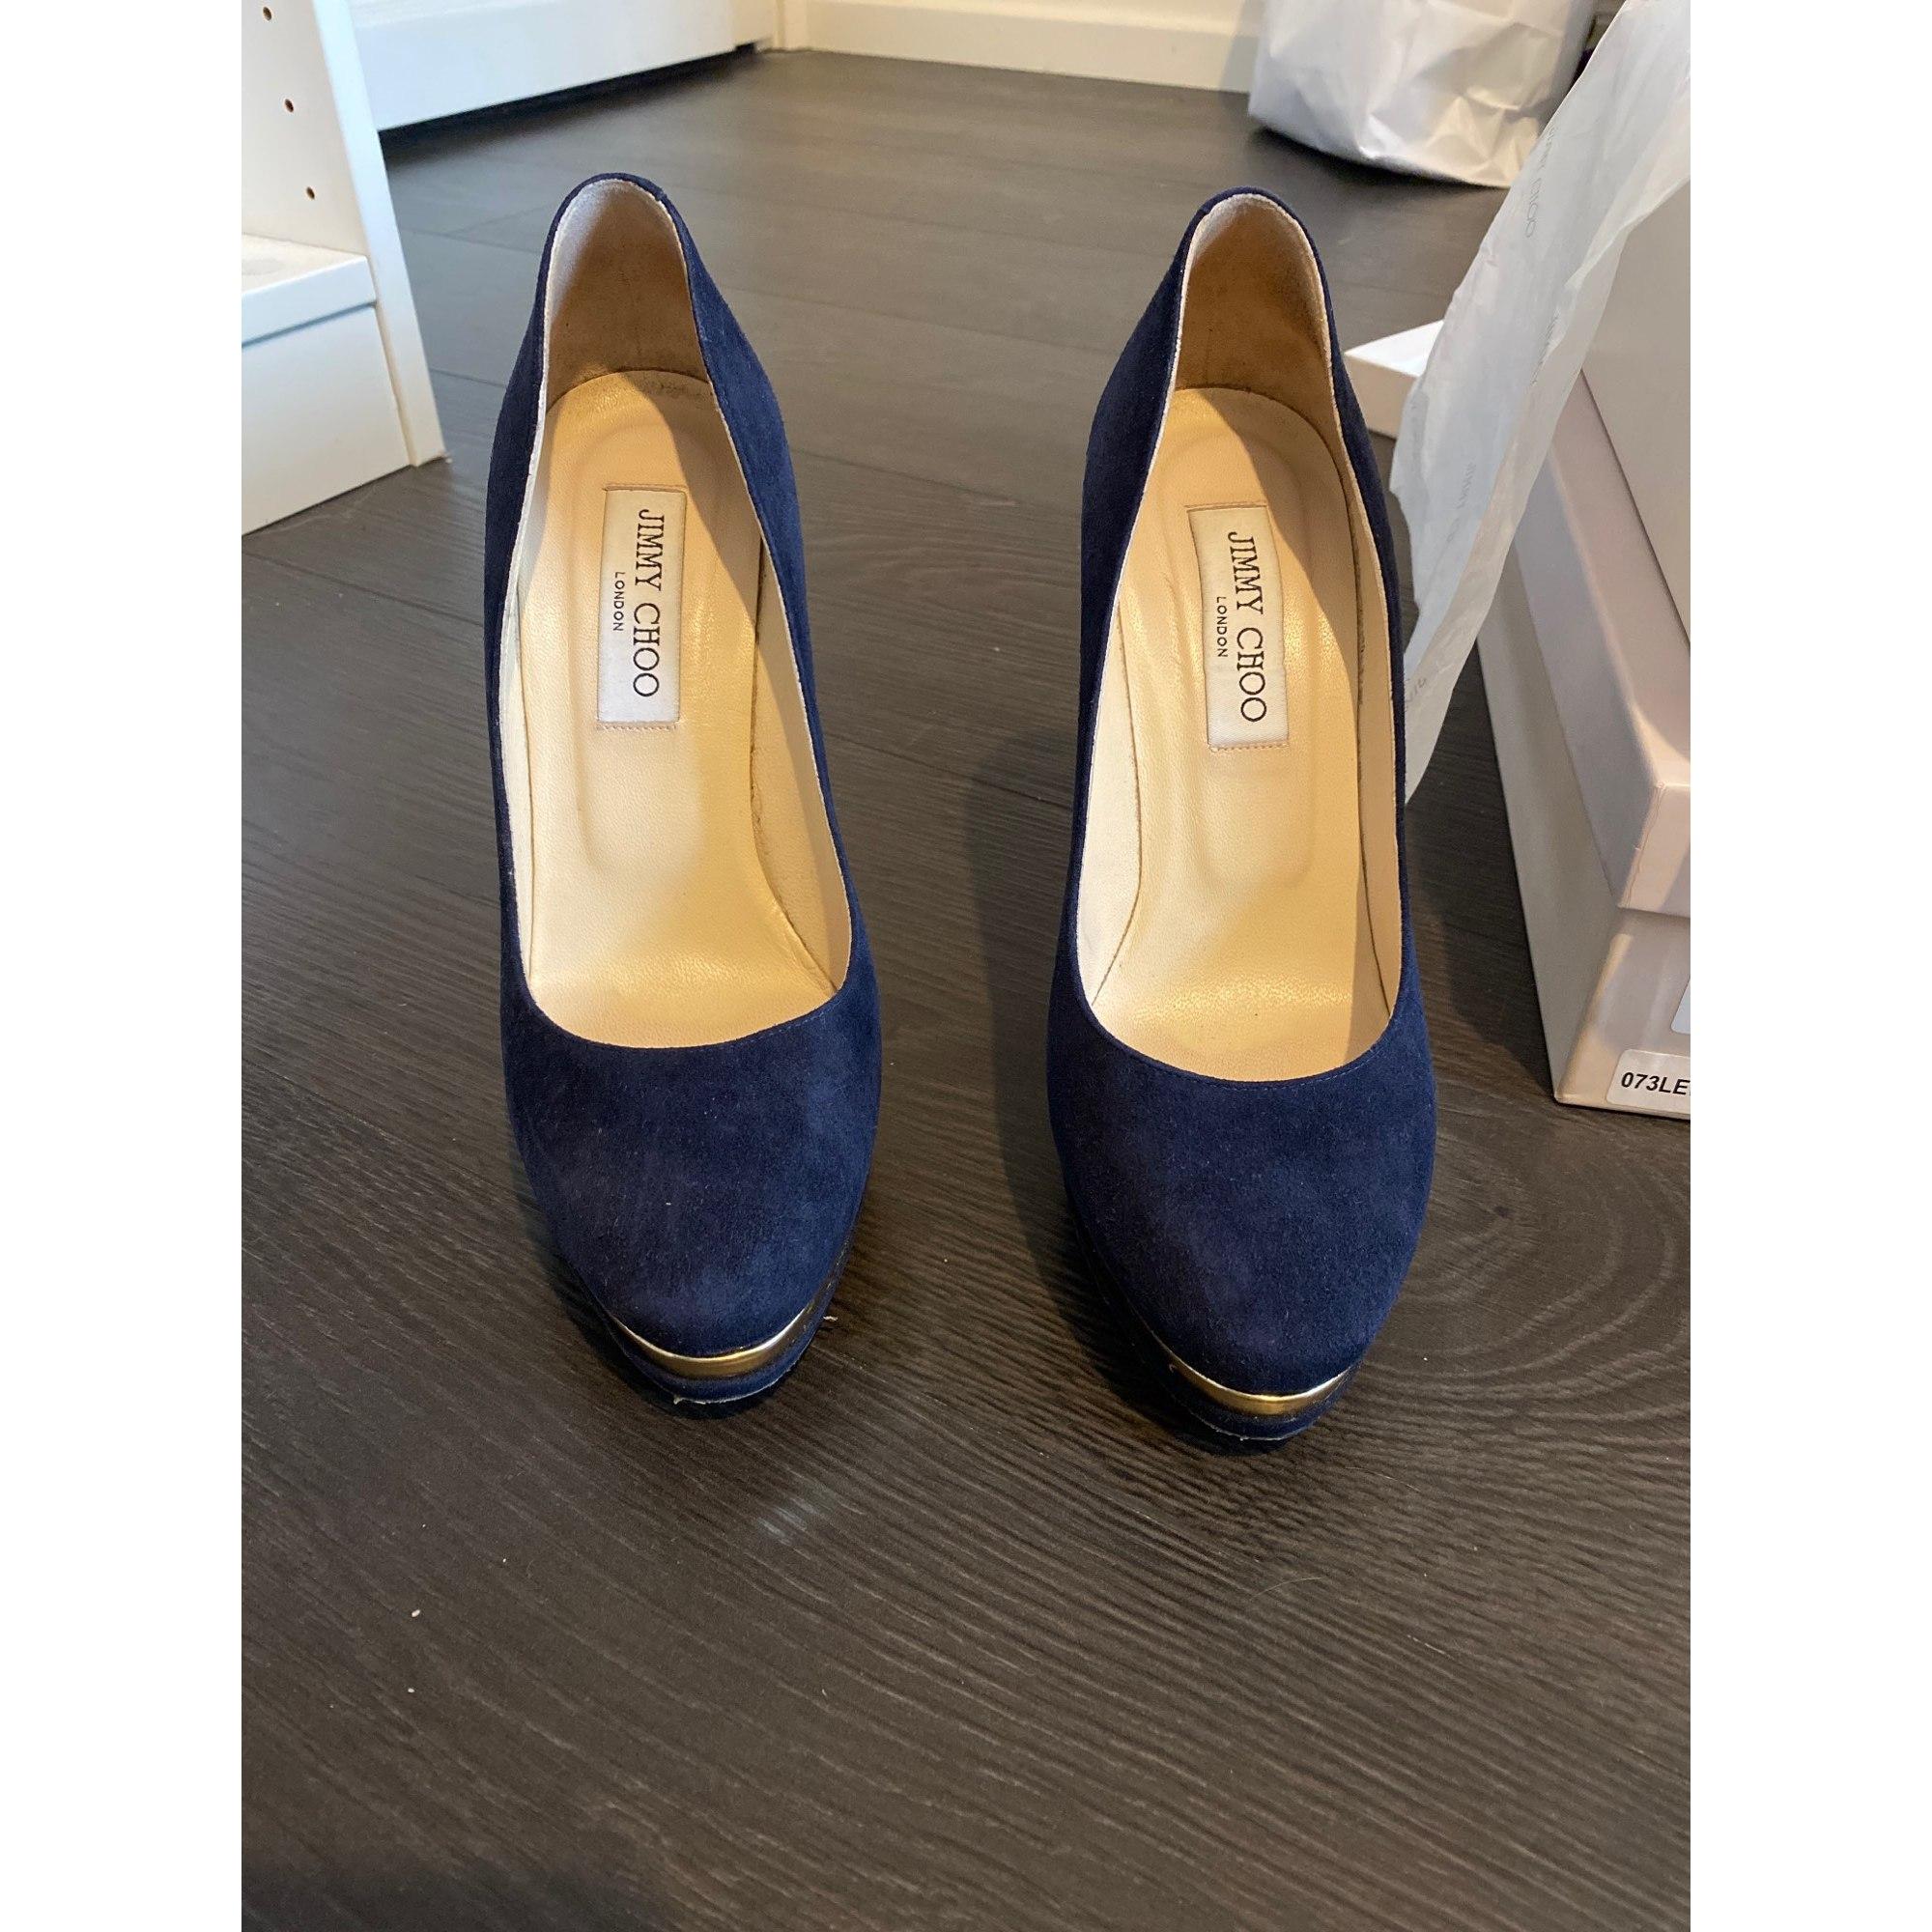 Escarpins compensés JIMMY CHOO Bleu, bleu marine, bleu turquoise